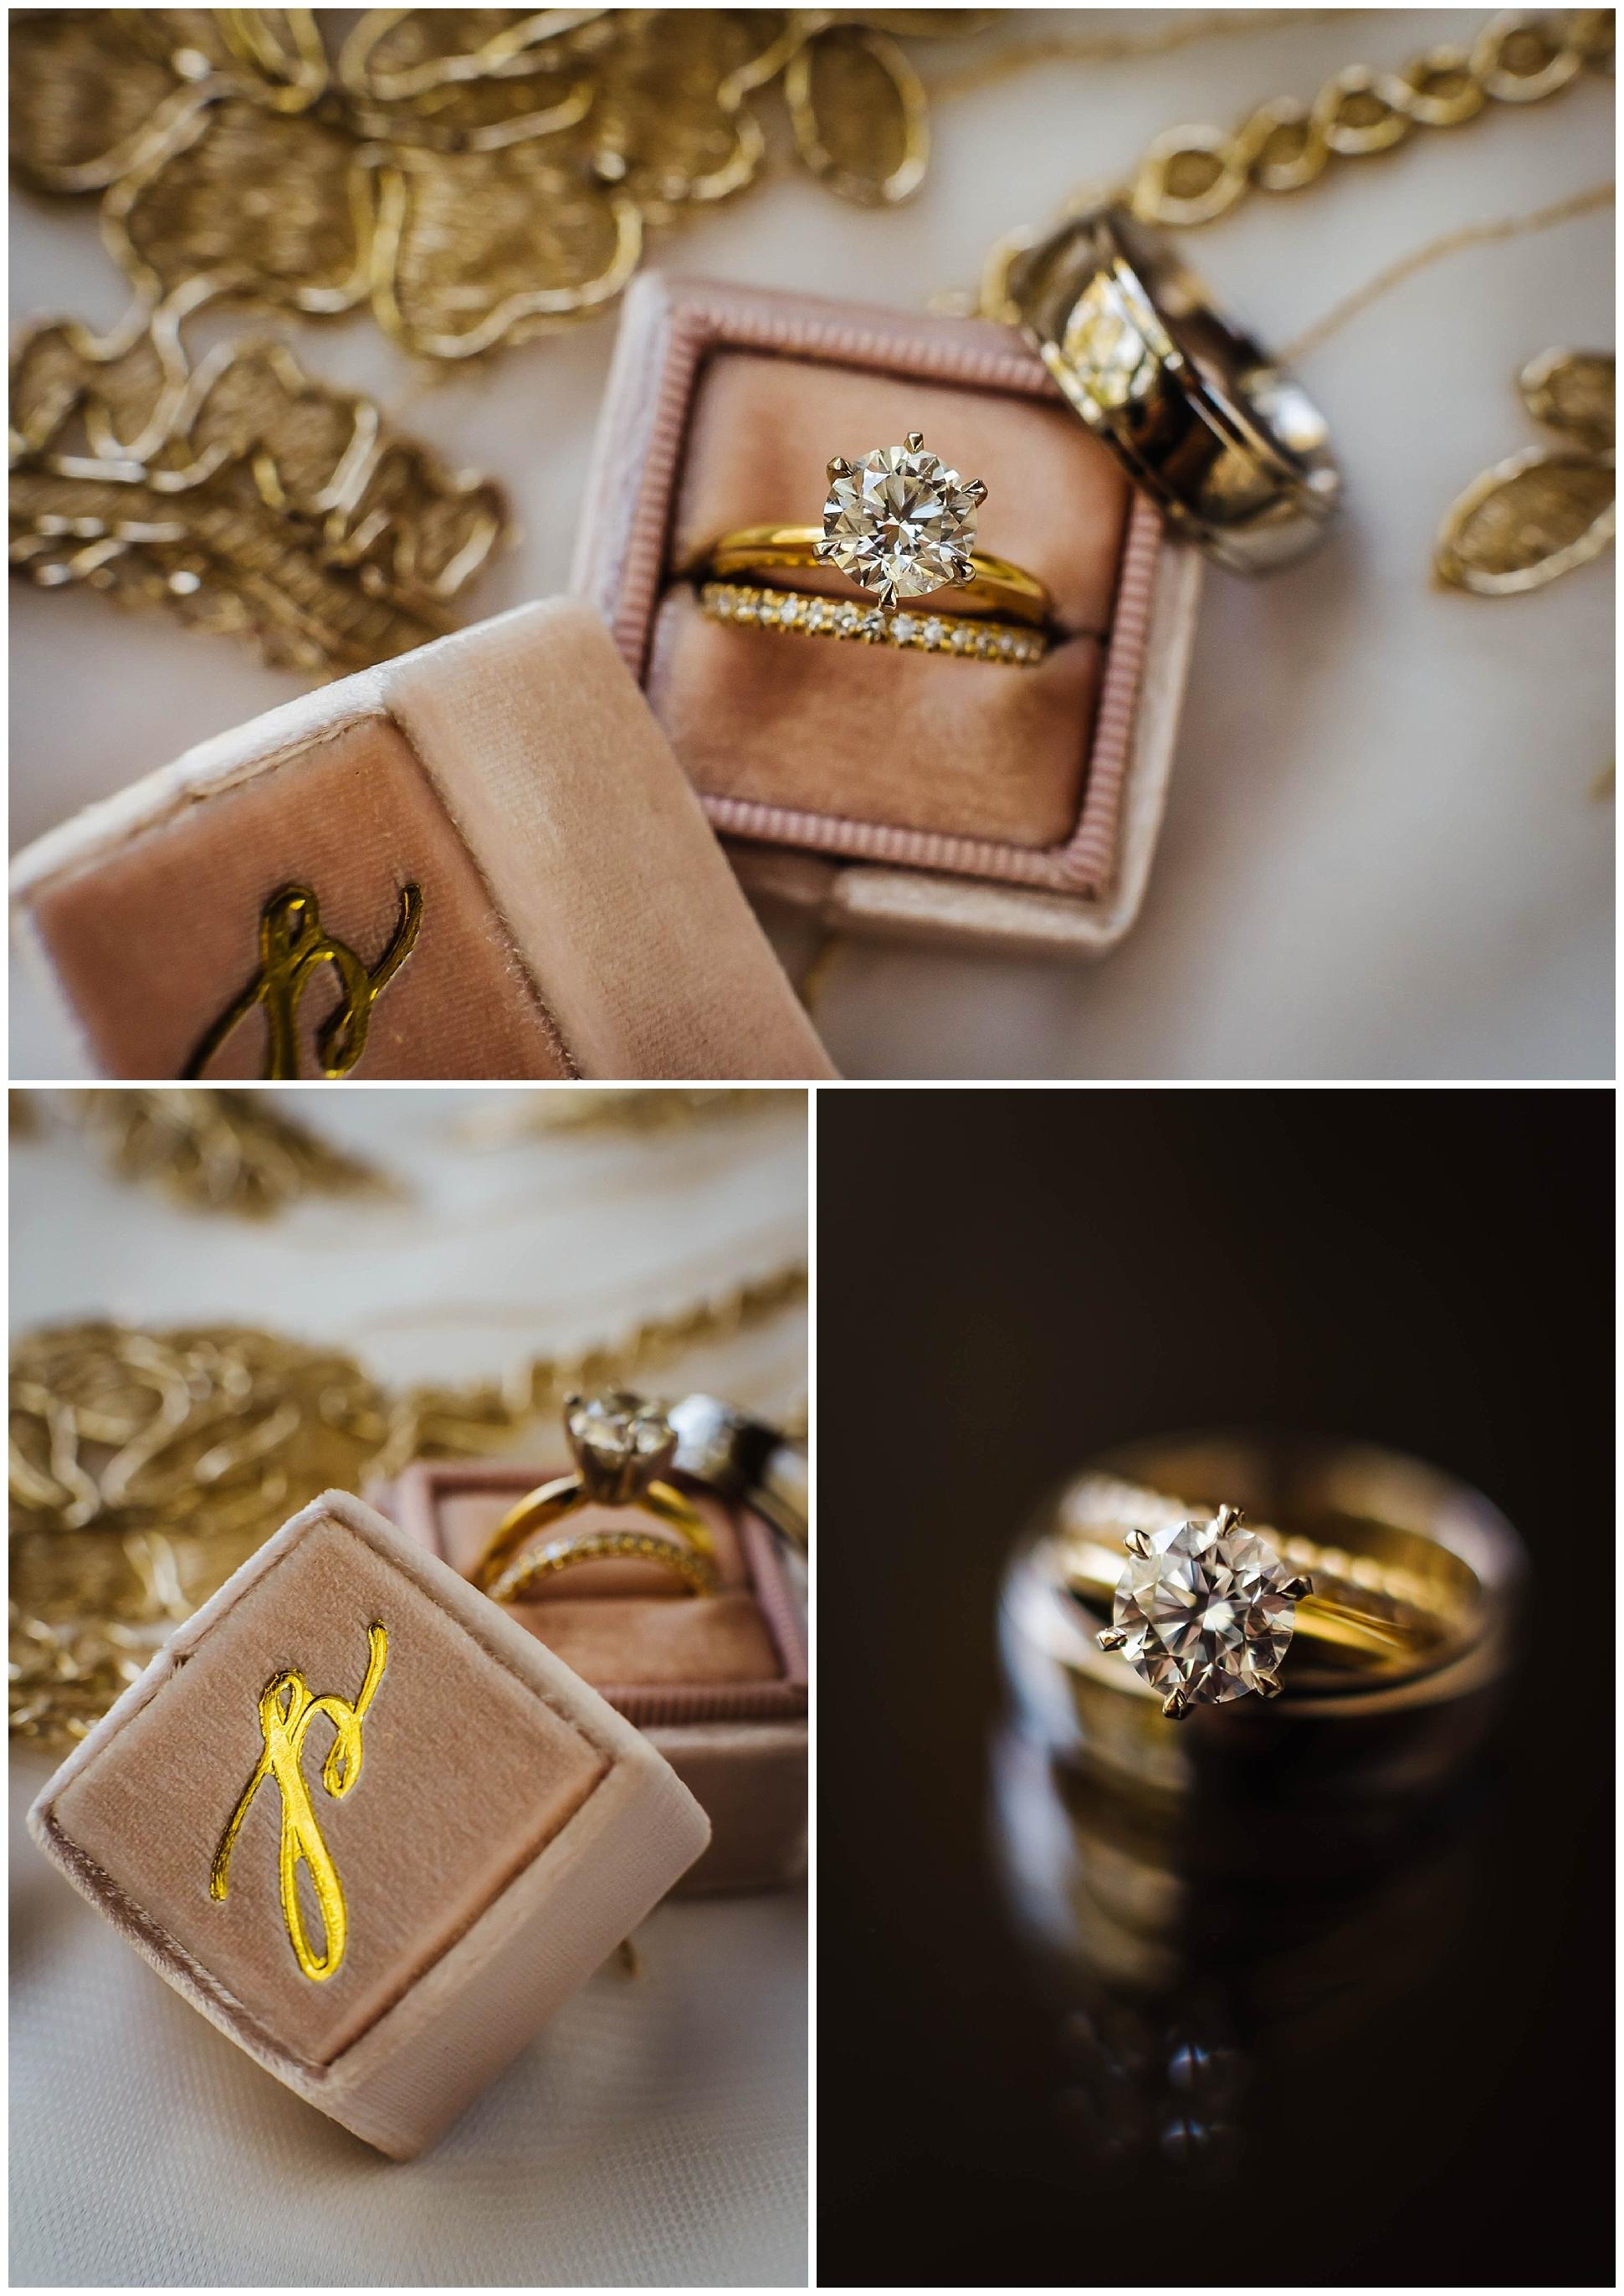 tampa-wedding-photographer-sleeves-palma-ceia-country-club-golf-course-sunset-luxury_0021.jpg